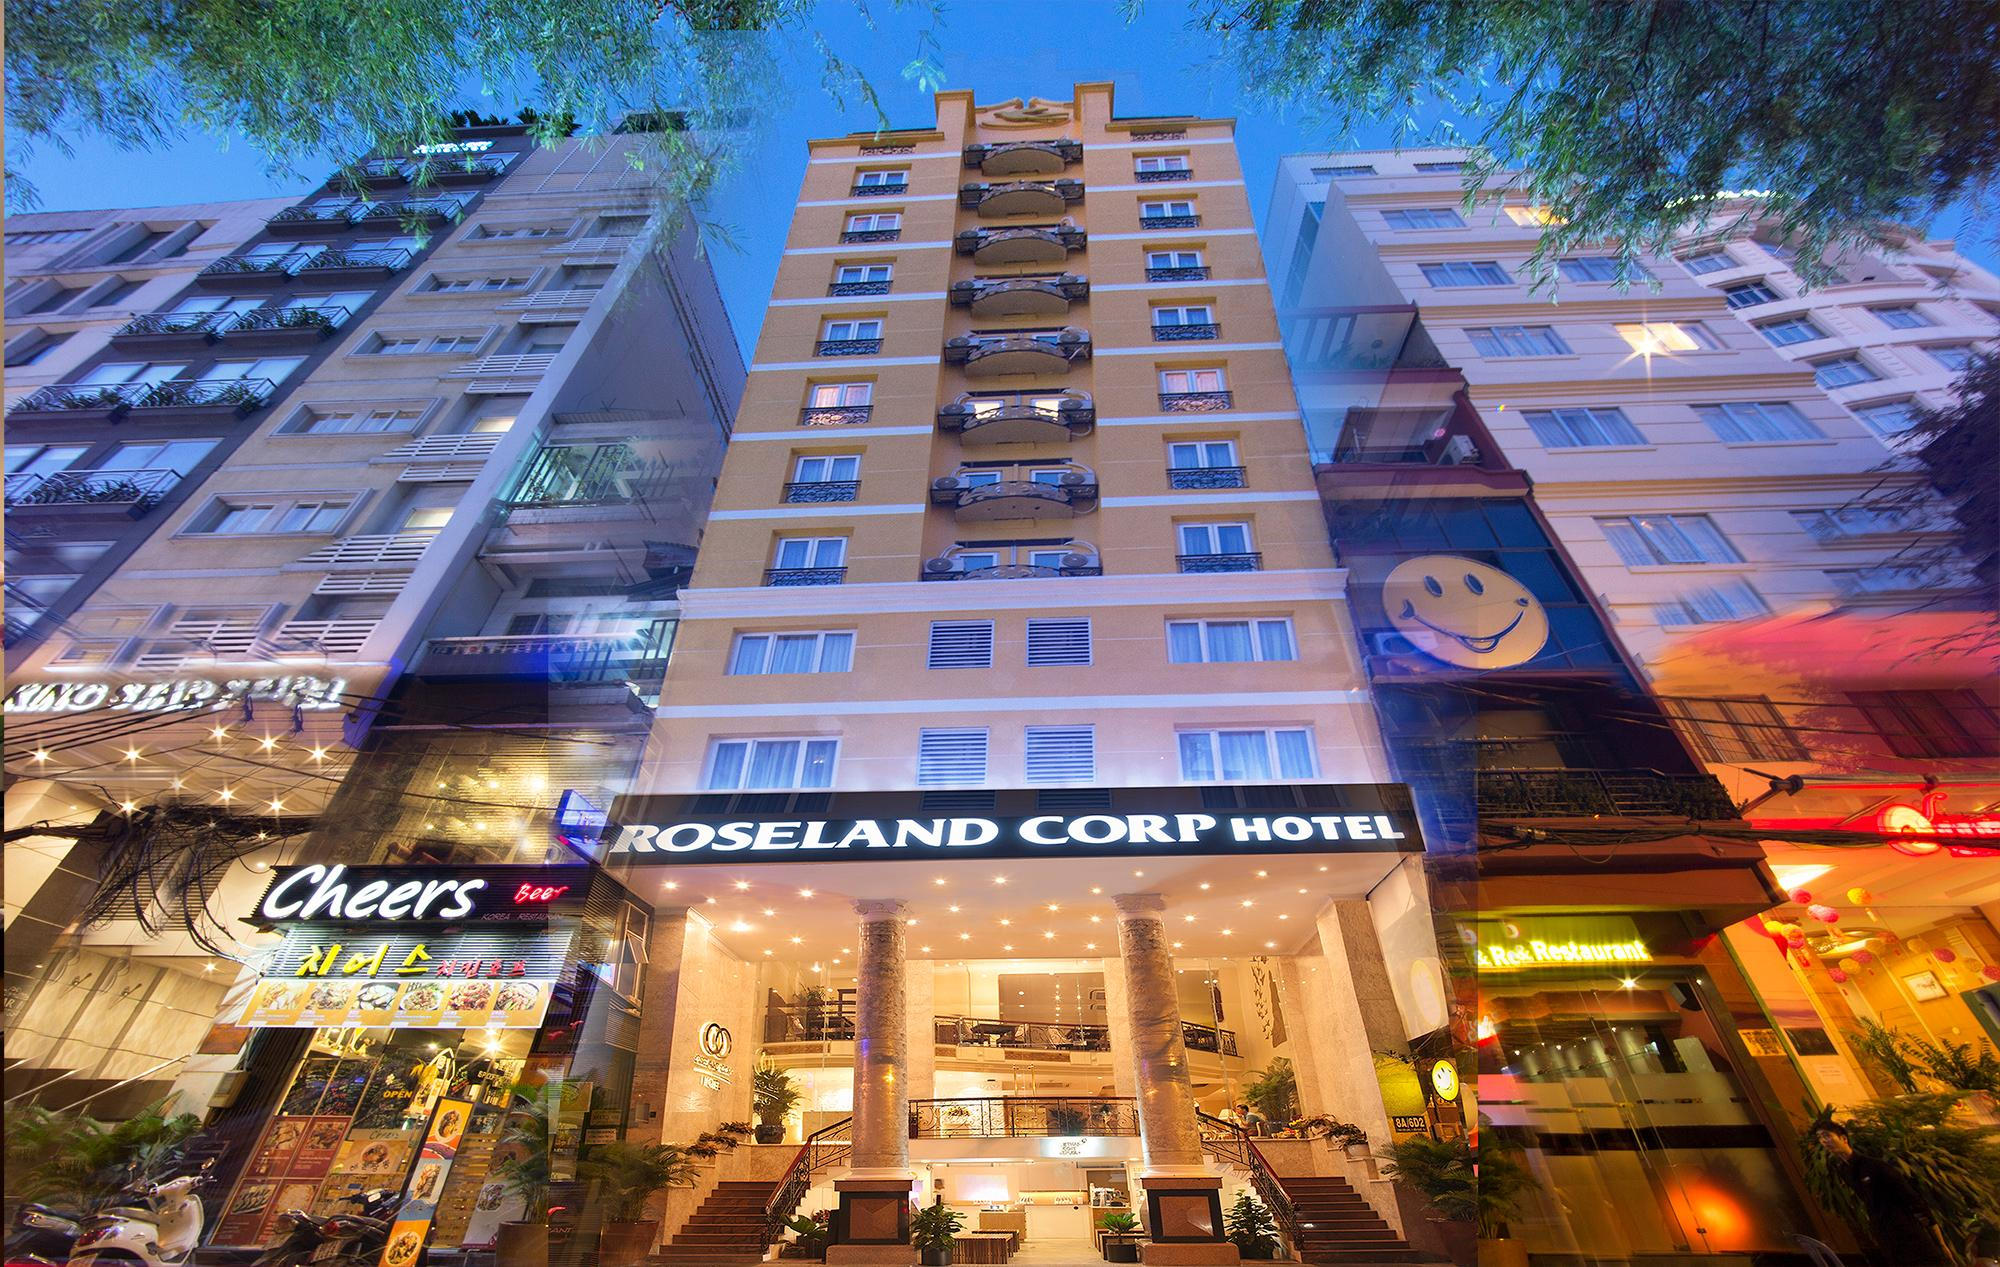 Roseland Corp Hotel